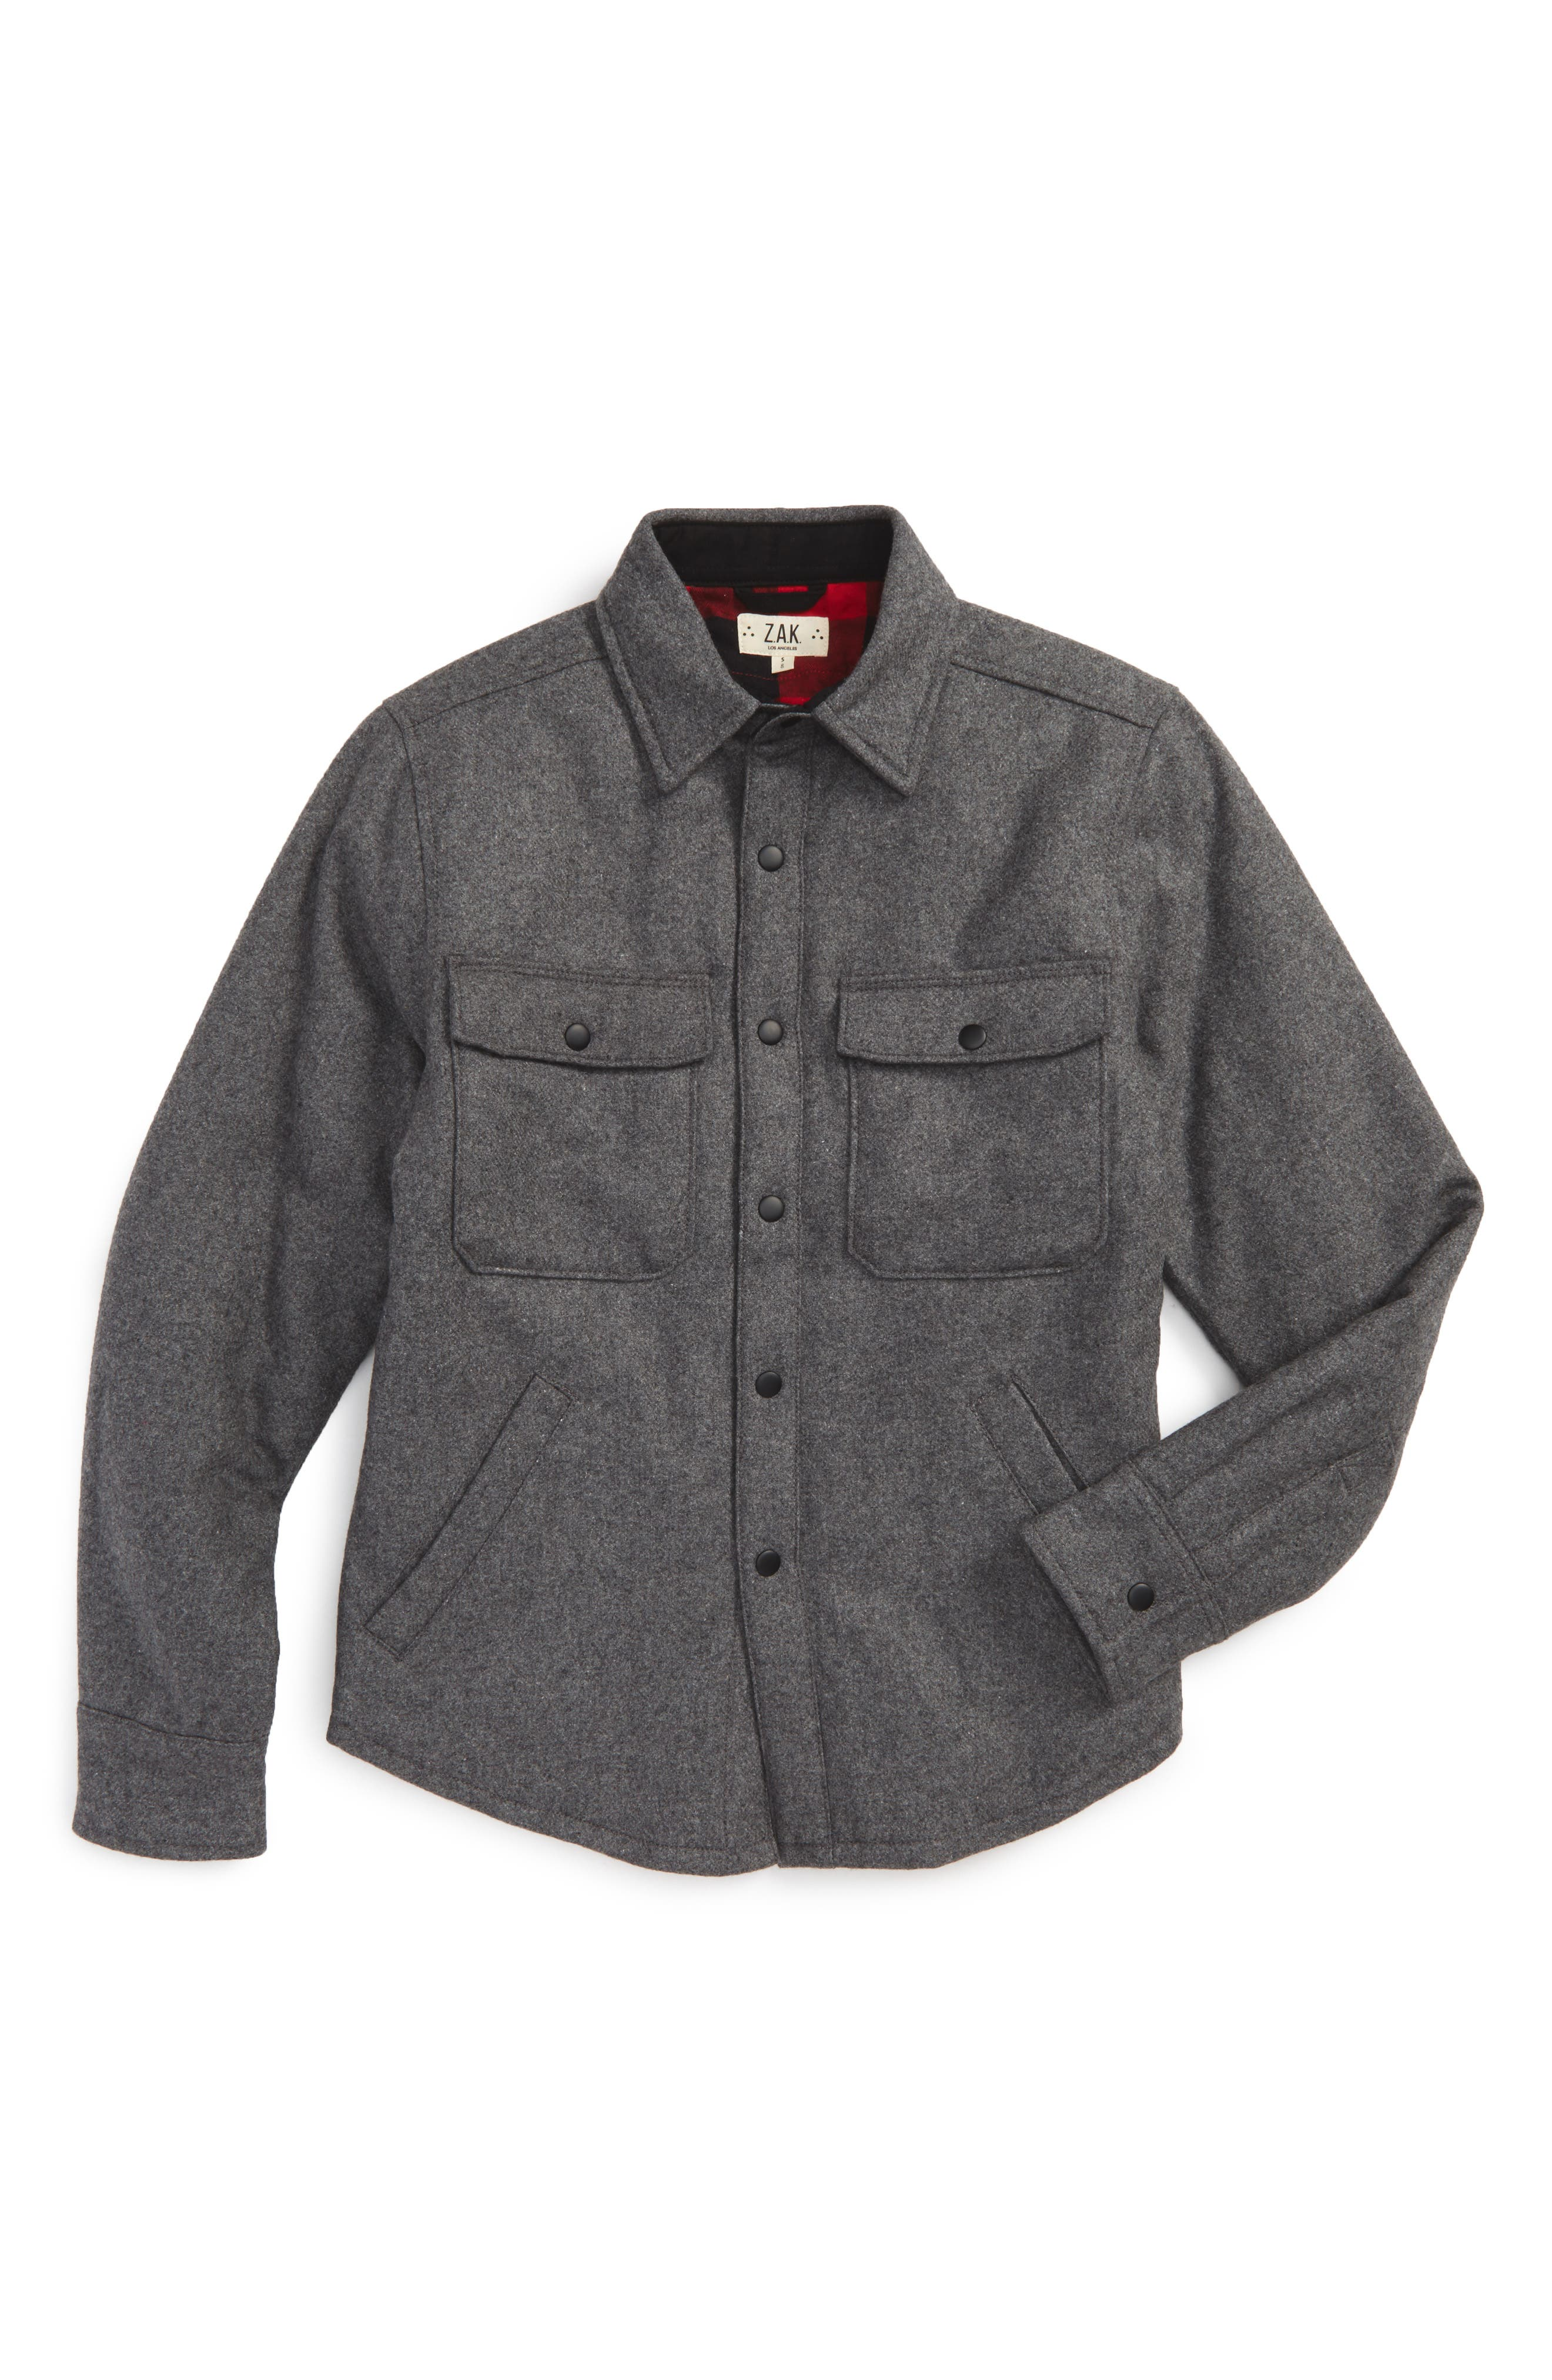 Alternate Image 1 Selected - Z.A.K. Brand Flannel Shirt Jacket (Little Boys)